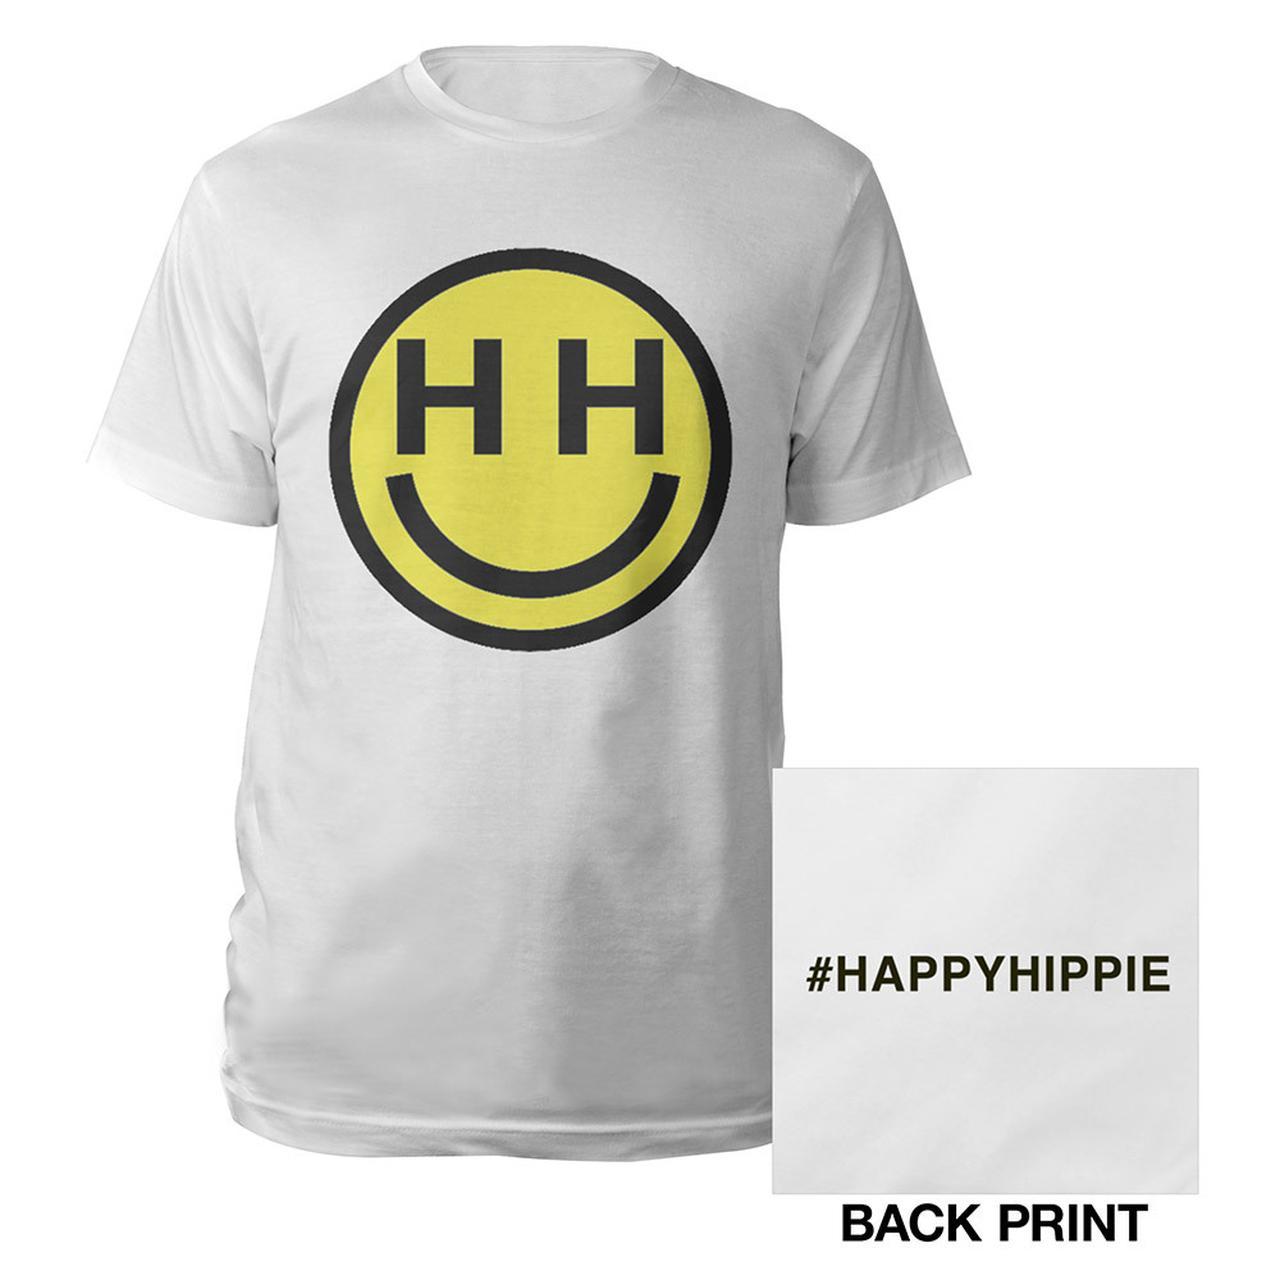 miley cyrus happy hippie foundation t shirt. Black Bedroom Furniture Sets. Home Design Ideas